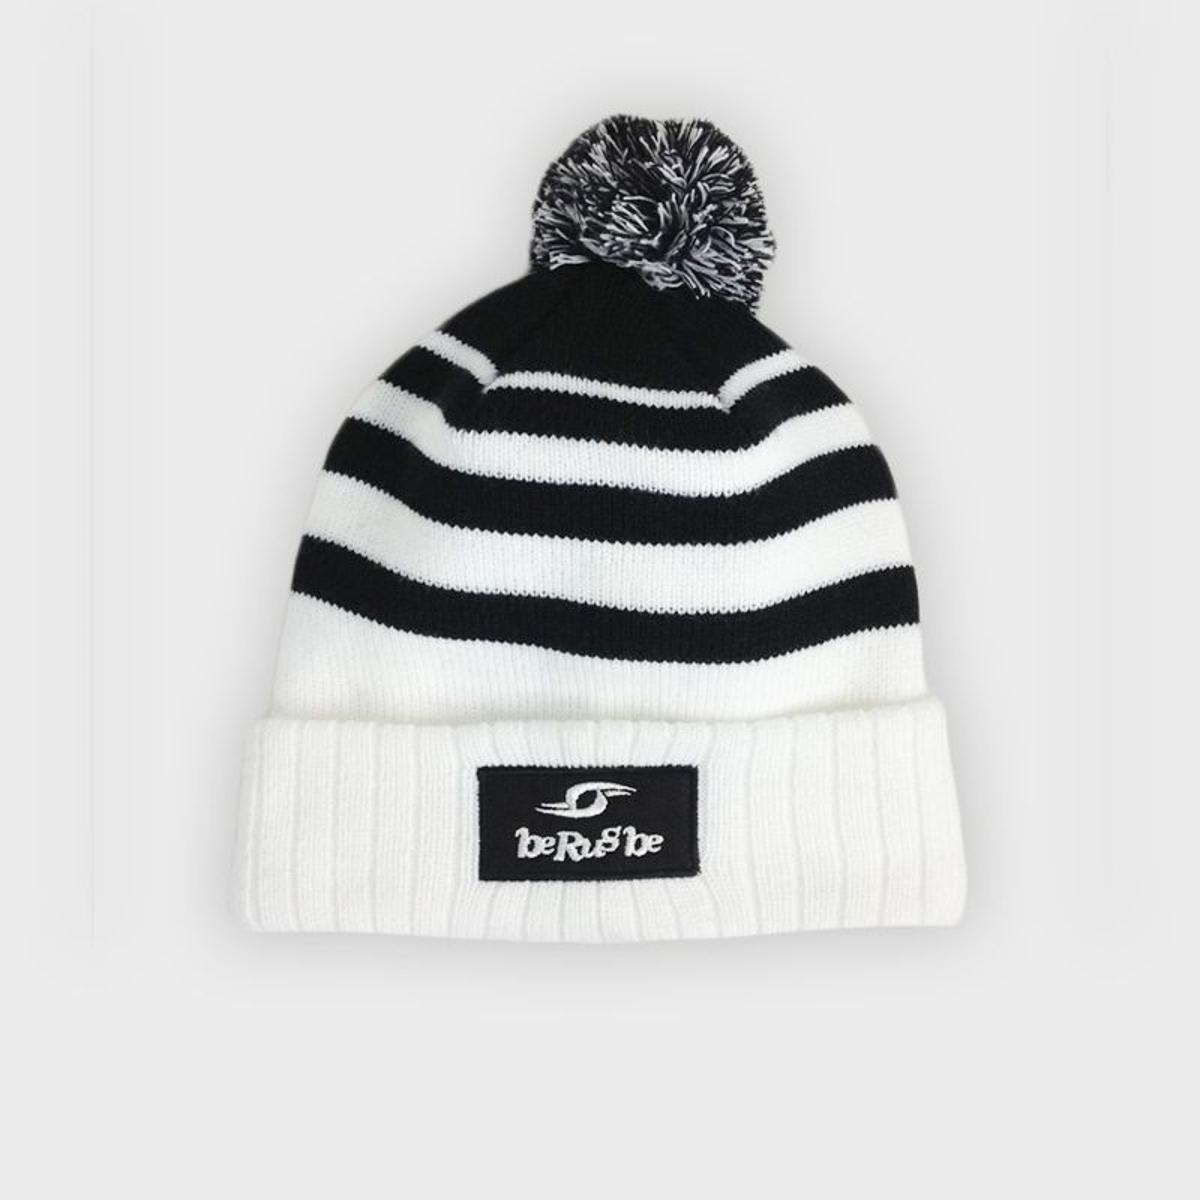 Bonnet Winter - Berugbe - Rayé Noir/Blanc - U